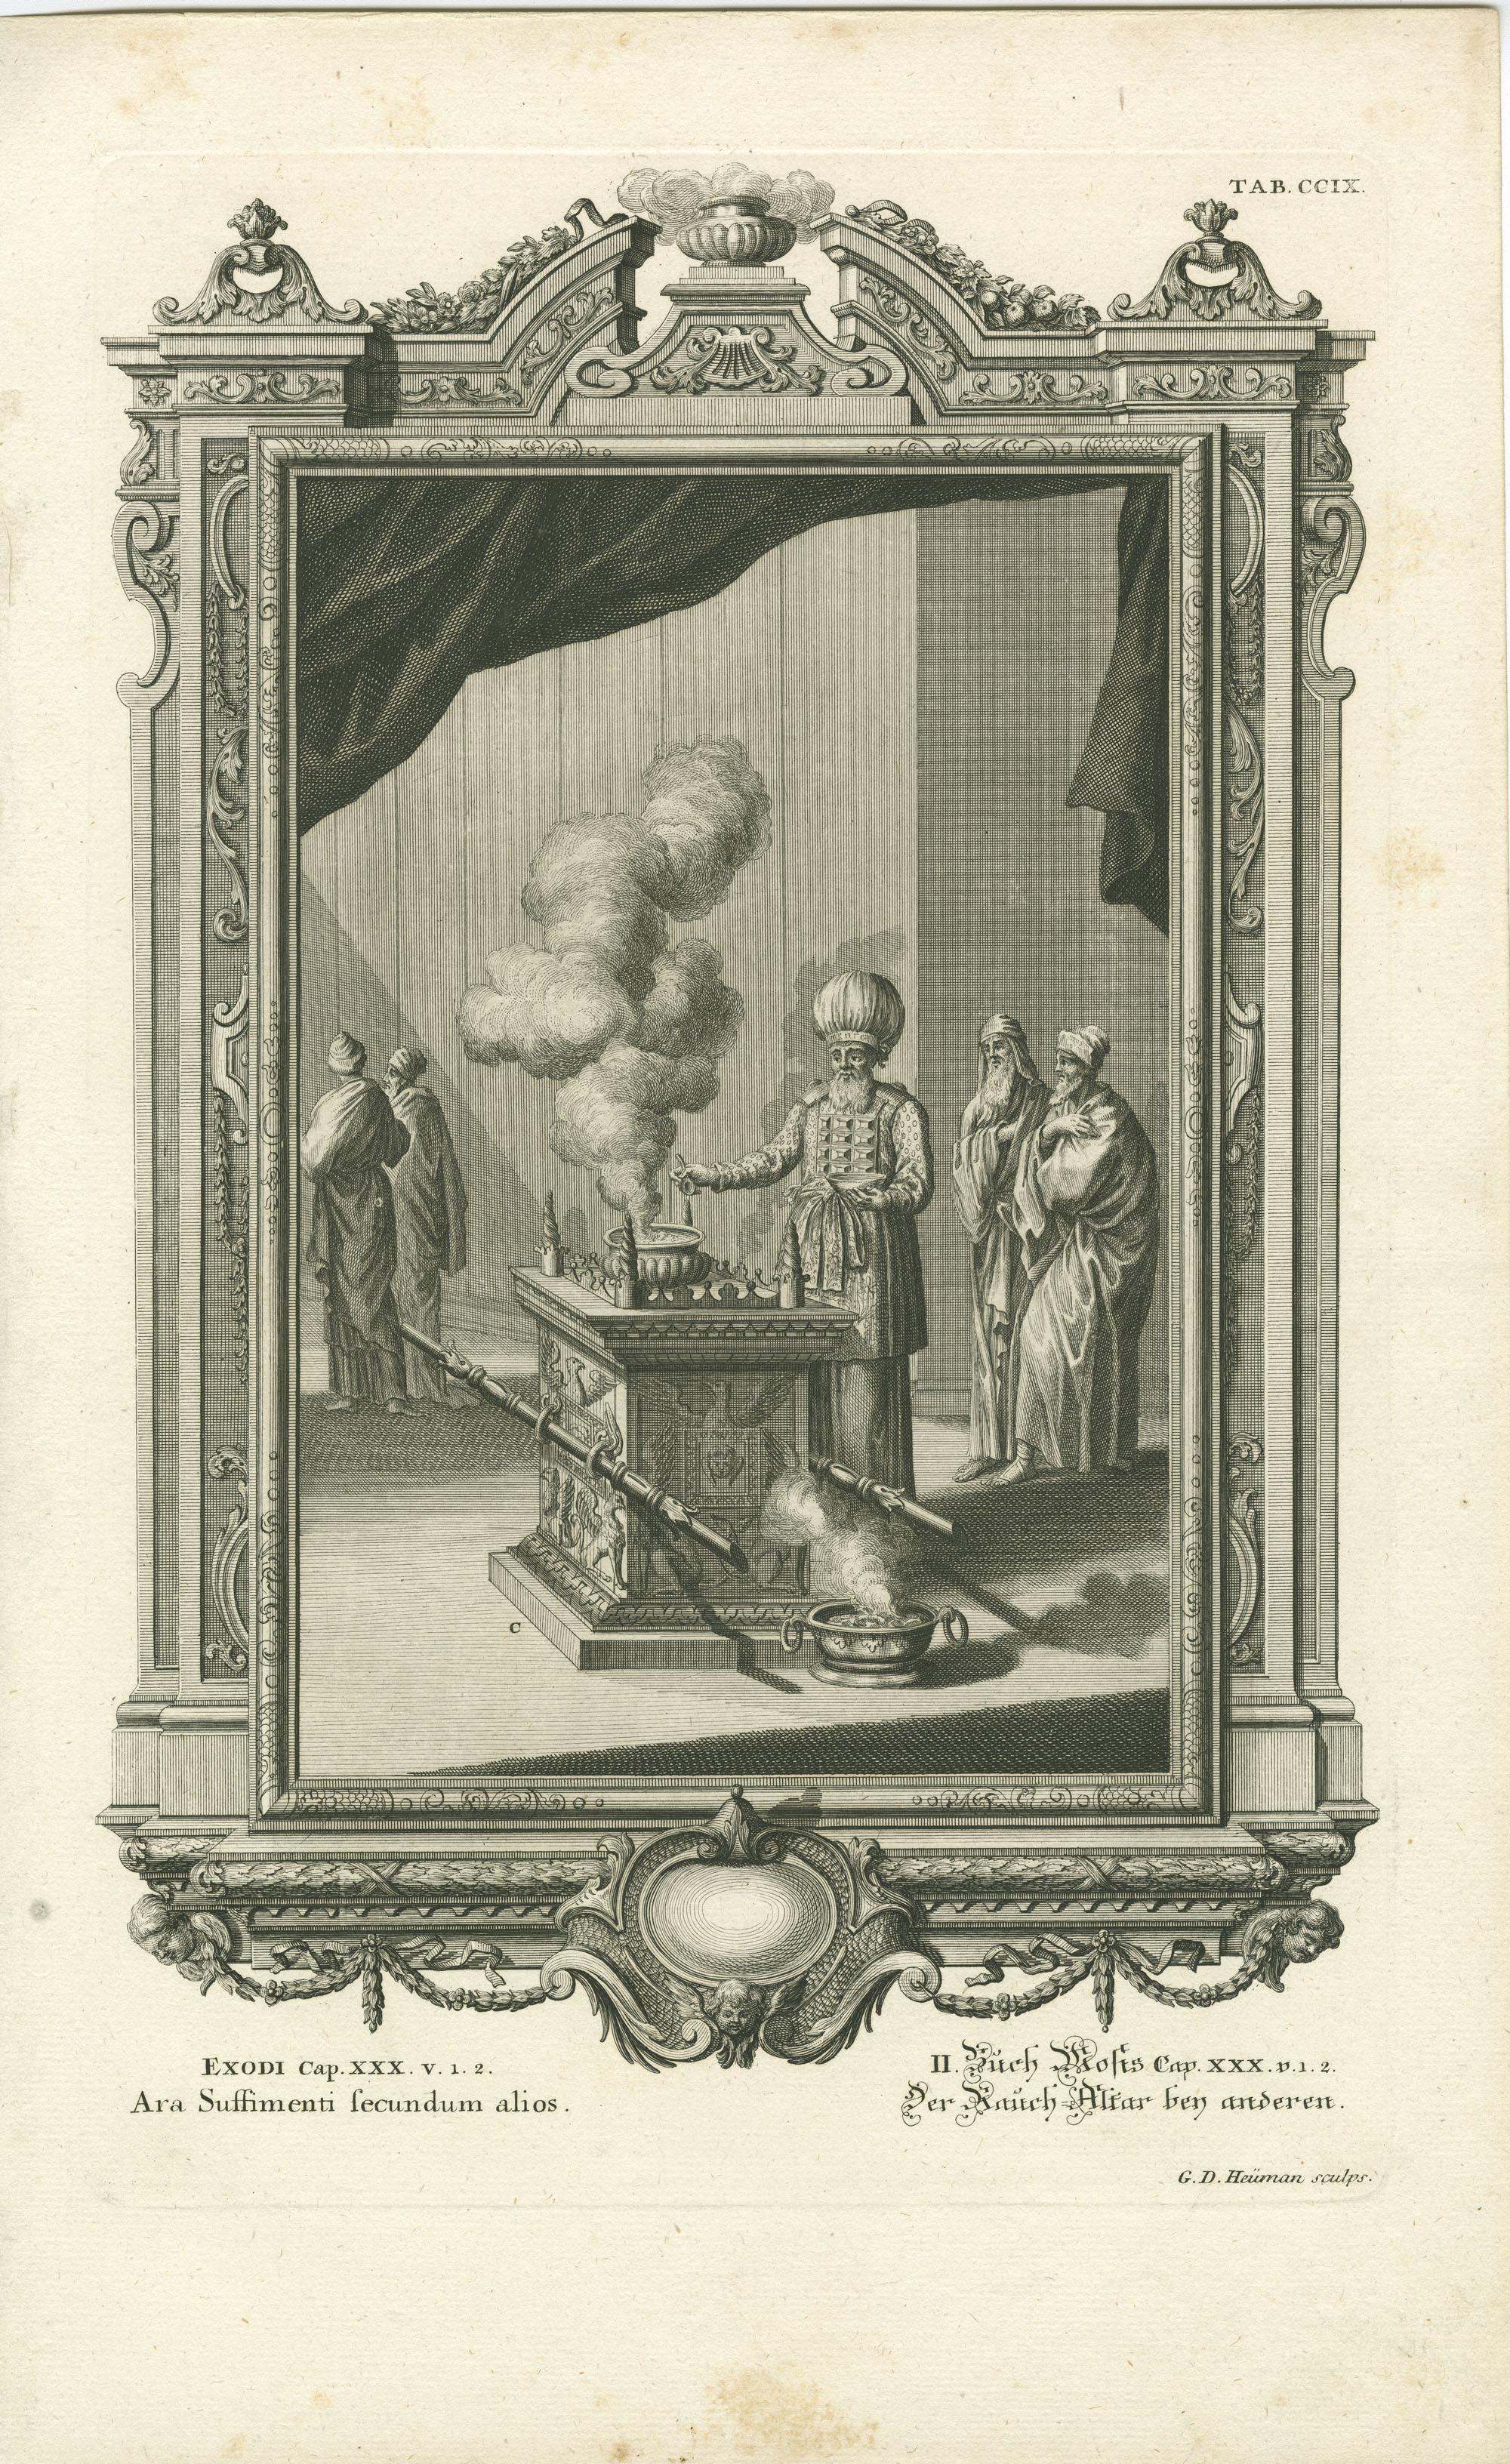 Exodi Cap. XXX v. 1.2 Ara Suffimenti secundum alios / II. Buch Mosis Cap. XXX v. 1.2 Der Rauch-Altar bey anderen